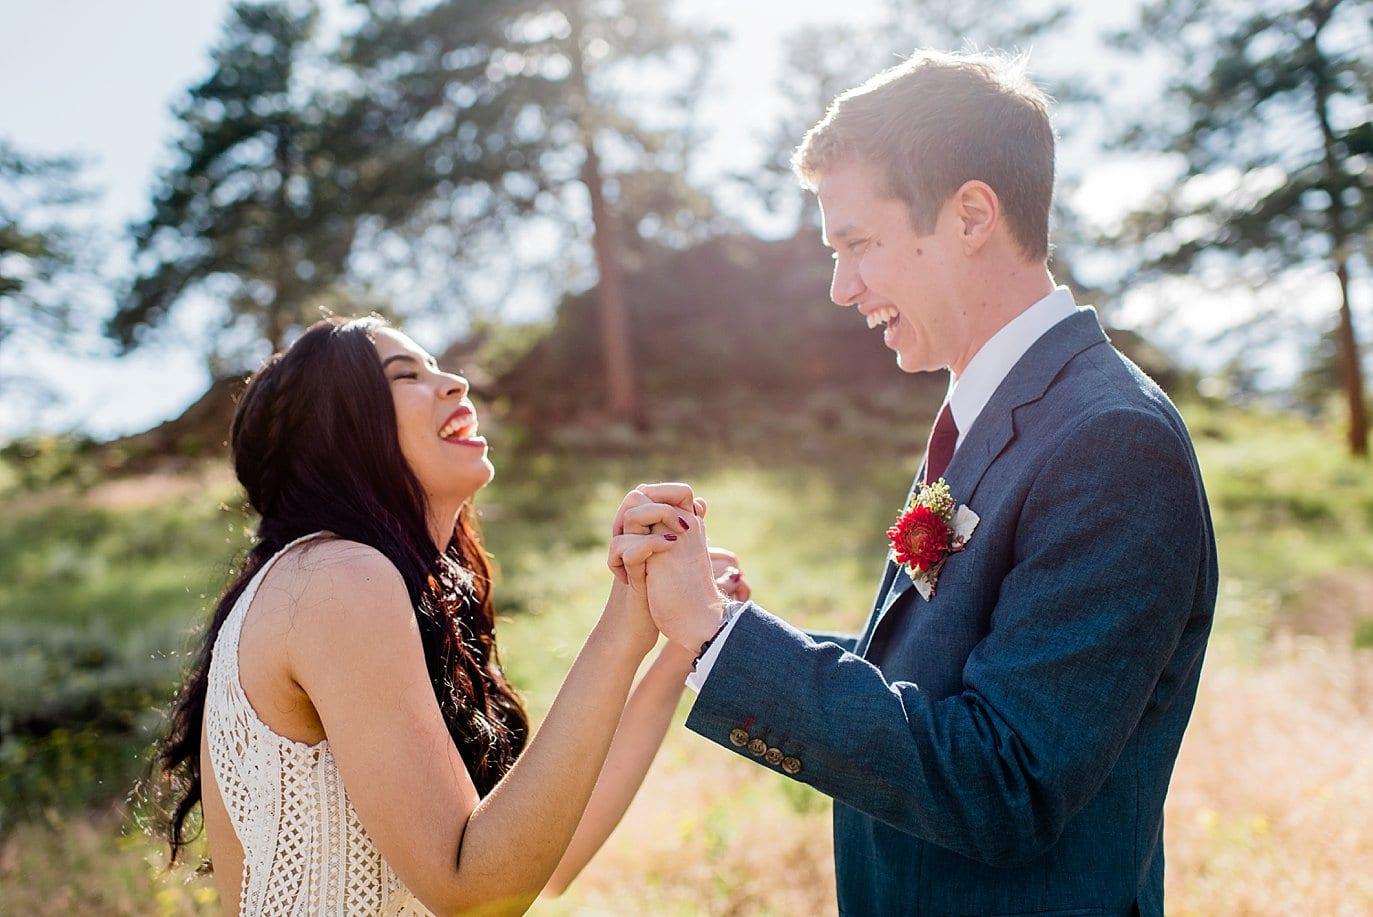 joyful 3M Curve wedding at Rocky Mountain National Park Wedding by Rocky Mountain Colorado Wedding Photographer Jennie Crate